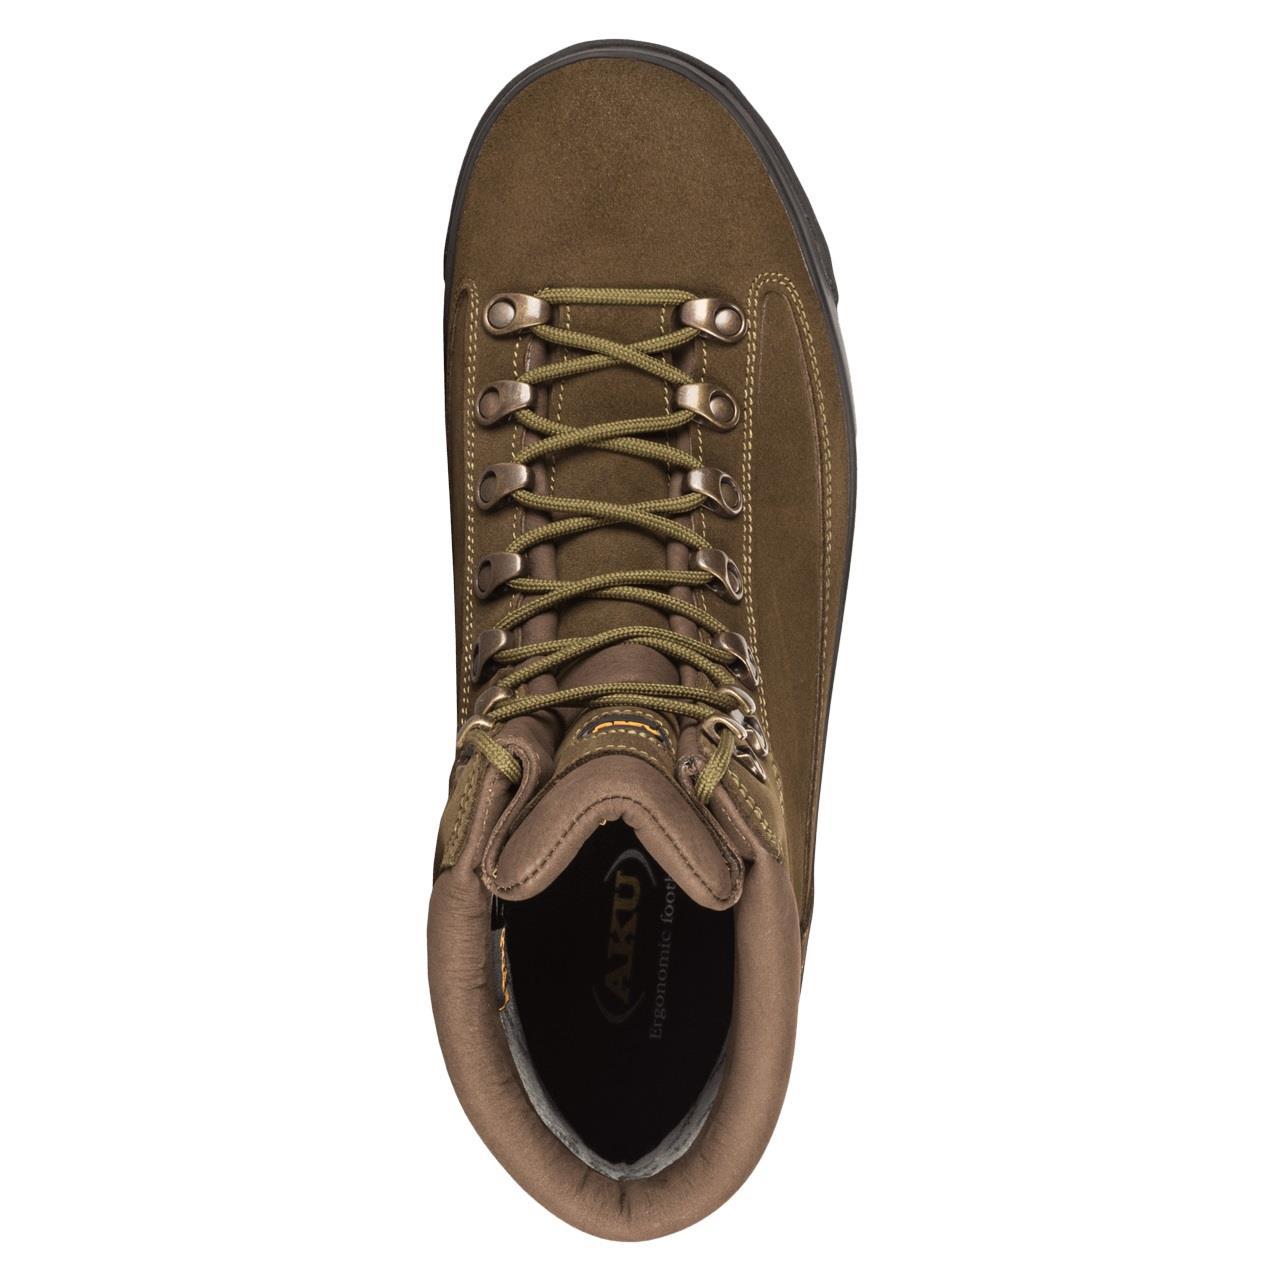 Aku Slope Max Süet Gore Tex Trekking Ayakkabısı Haki A890150